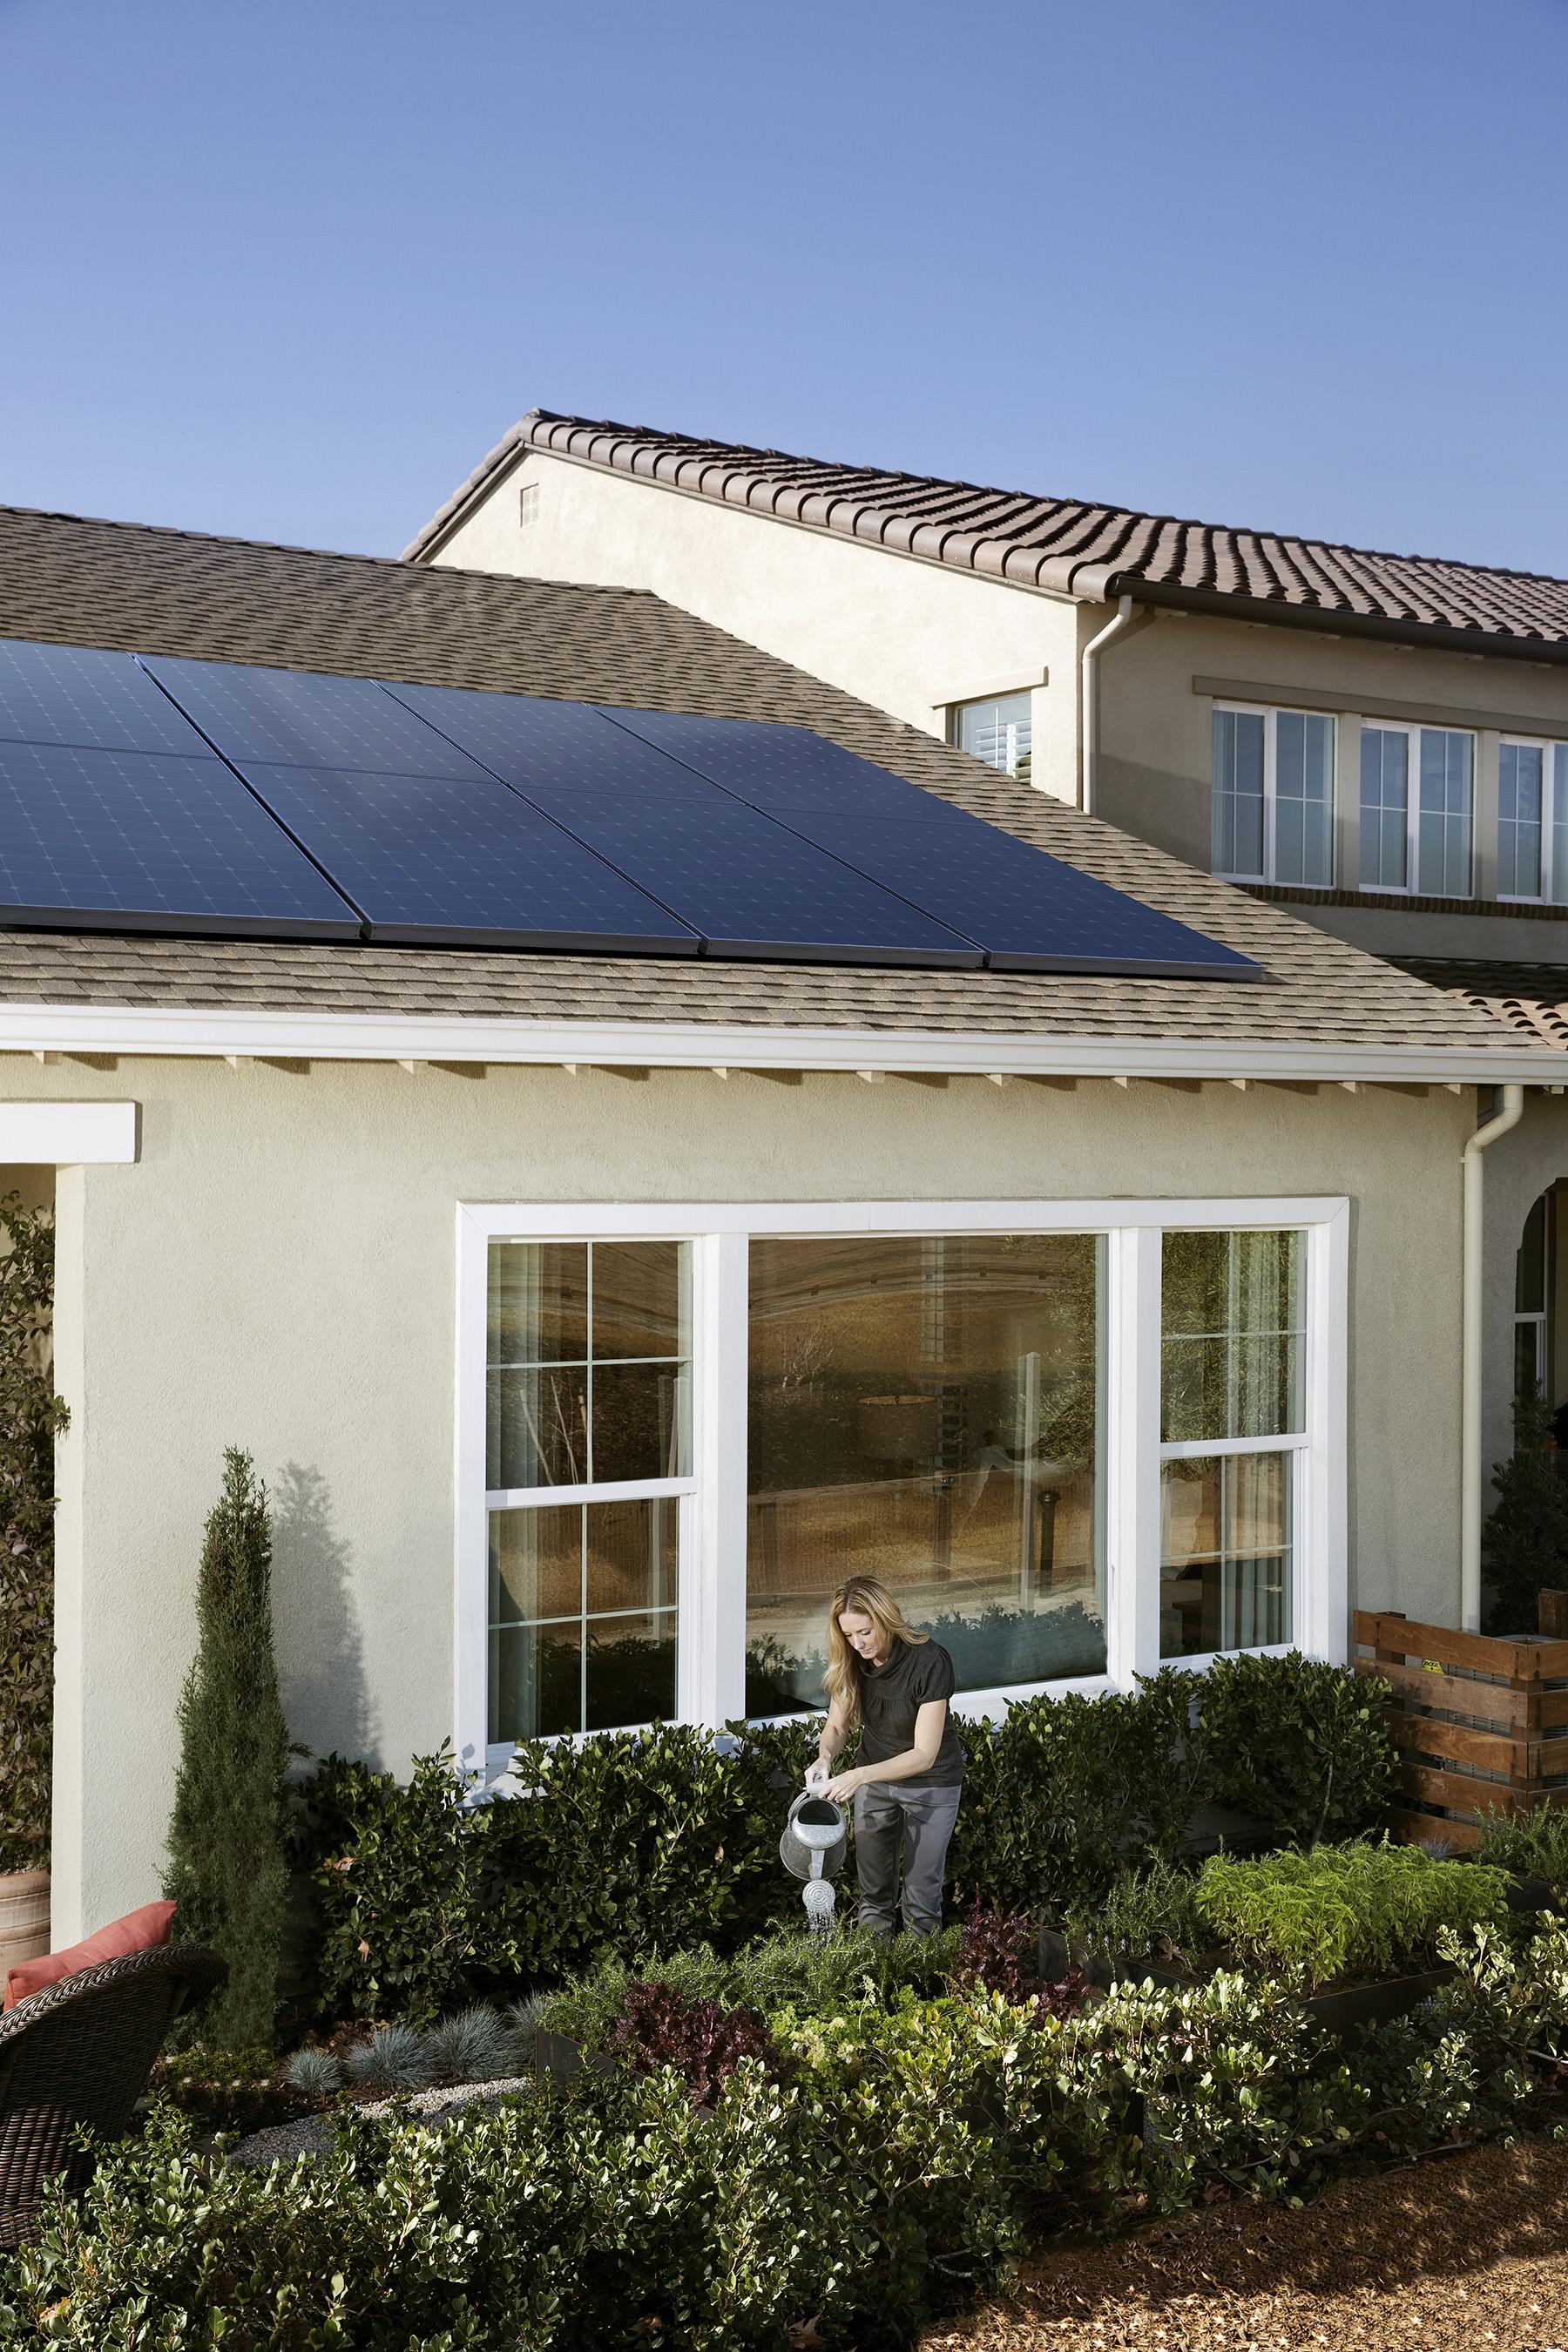 Sunpower Reinvents Home Solar With Sunpower Equinox